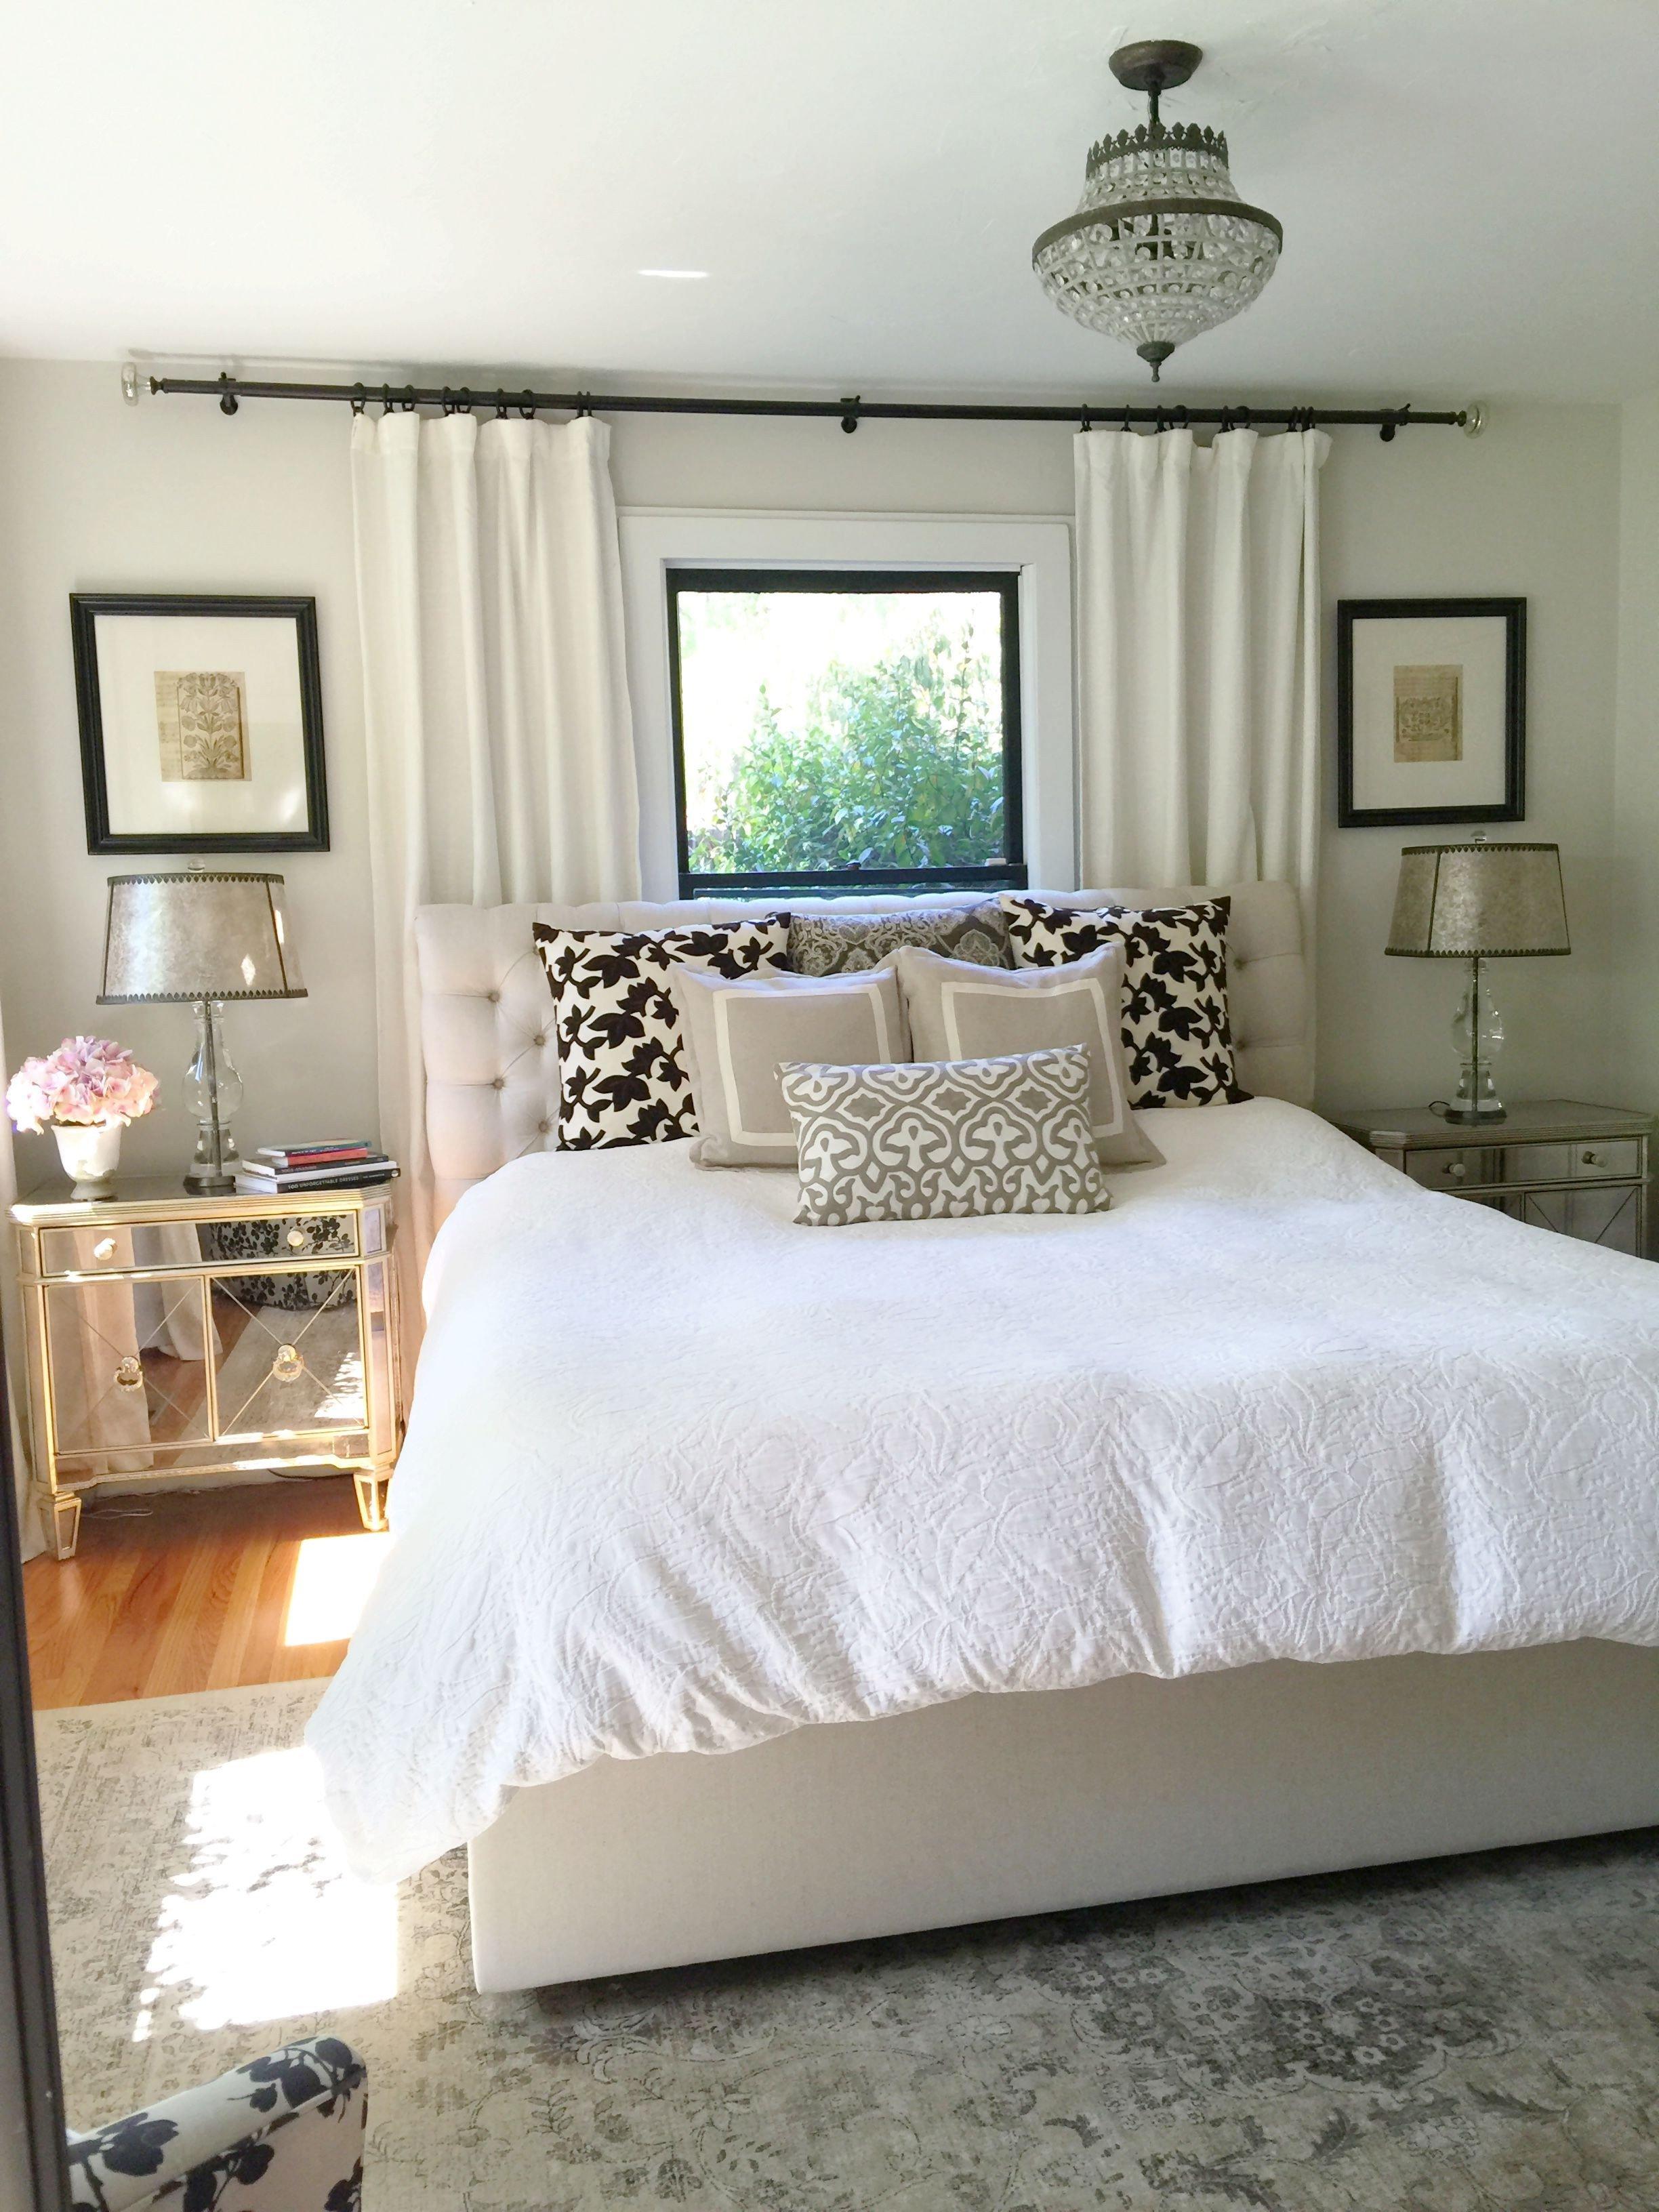 Small Master Bedroom Design Ideas Unique Neutral Bedroom Window Behind Bed Bedroom Window